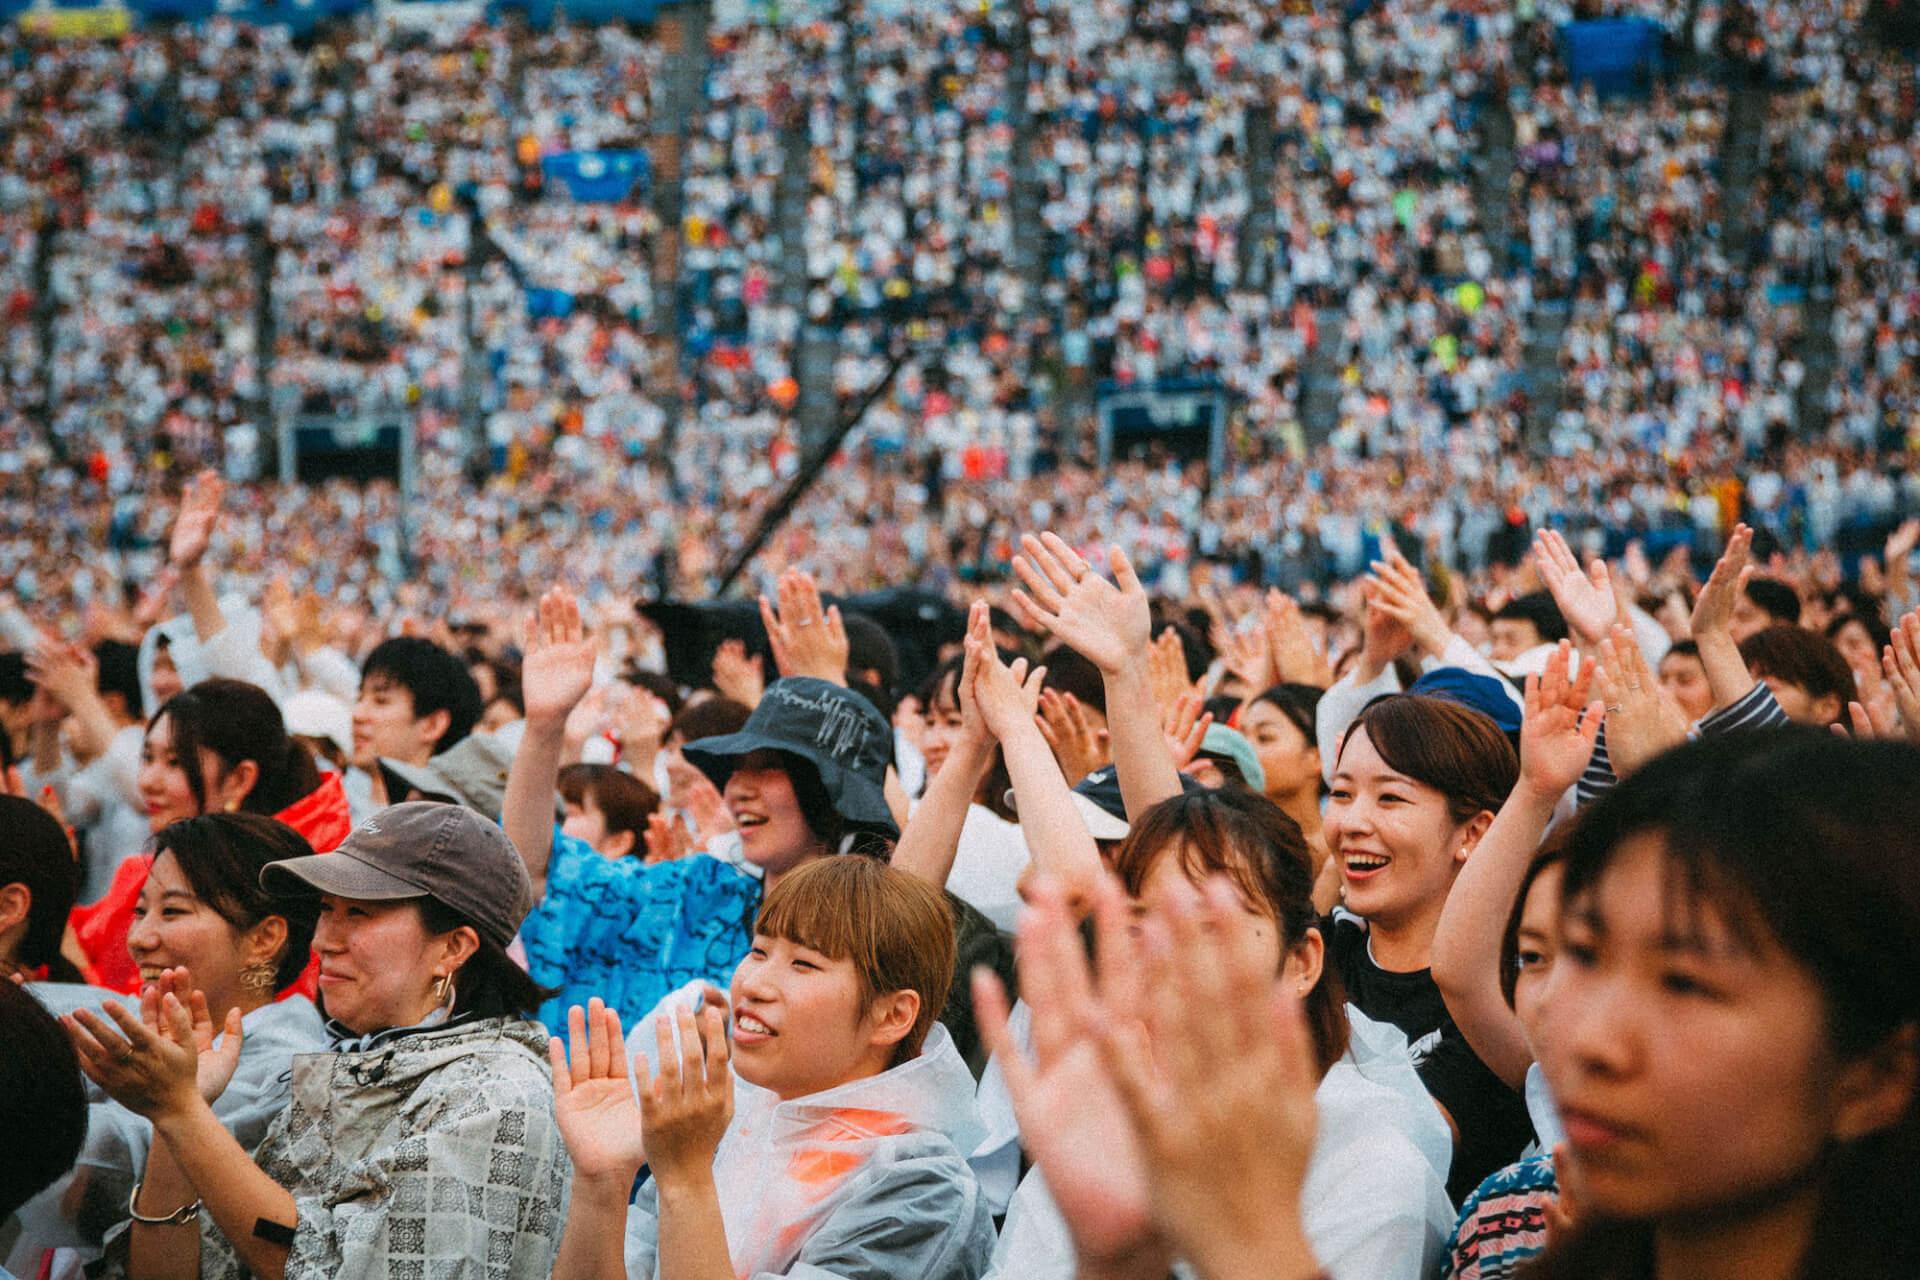 【Photo Documentary】Suchmos THE LIVE 横浜スタジアム report0920_suchmos_17